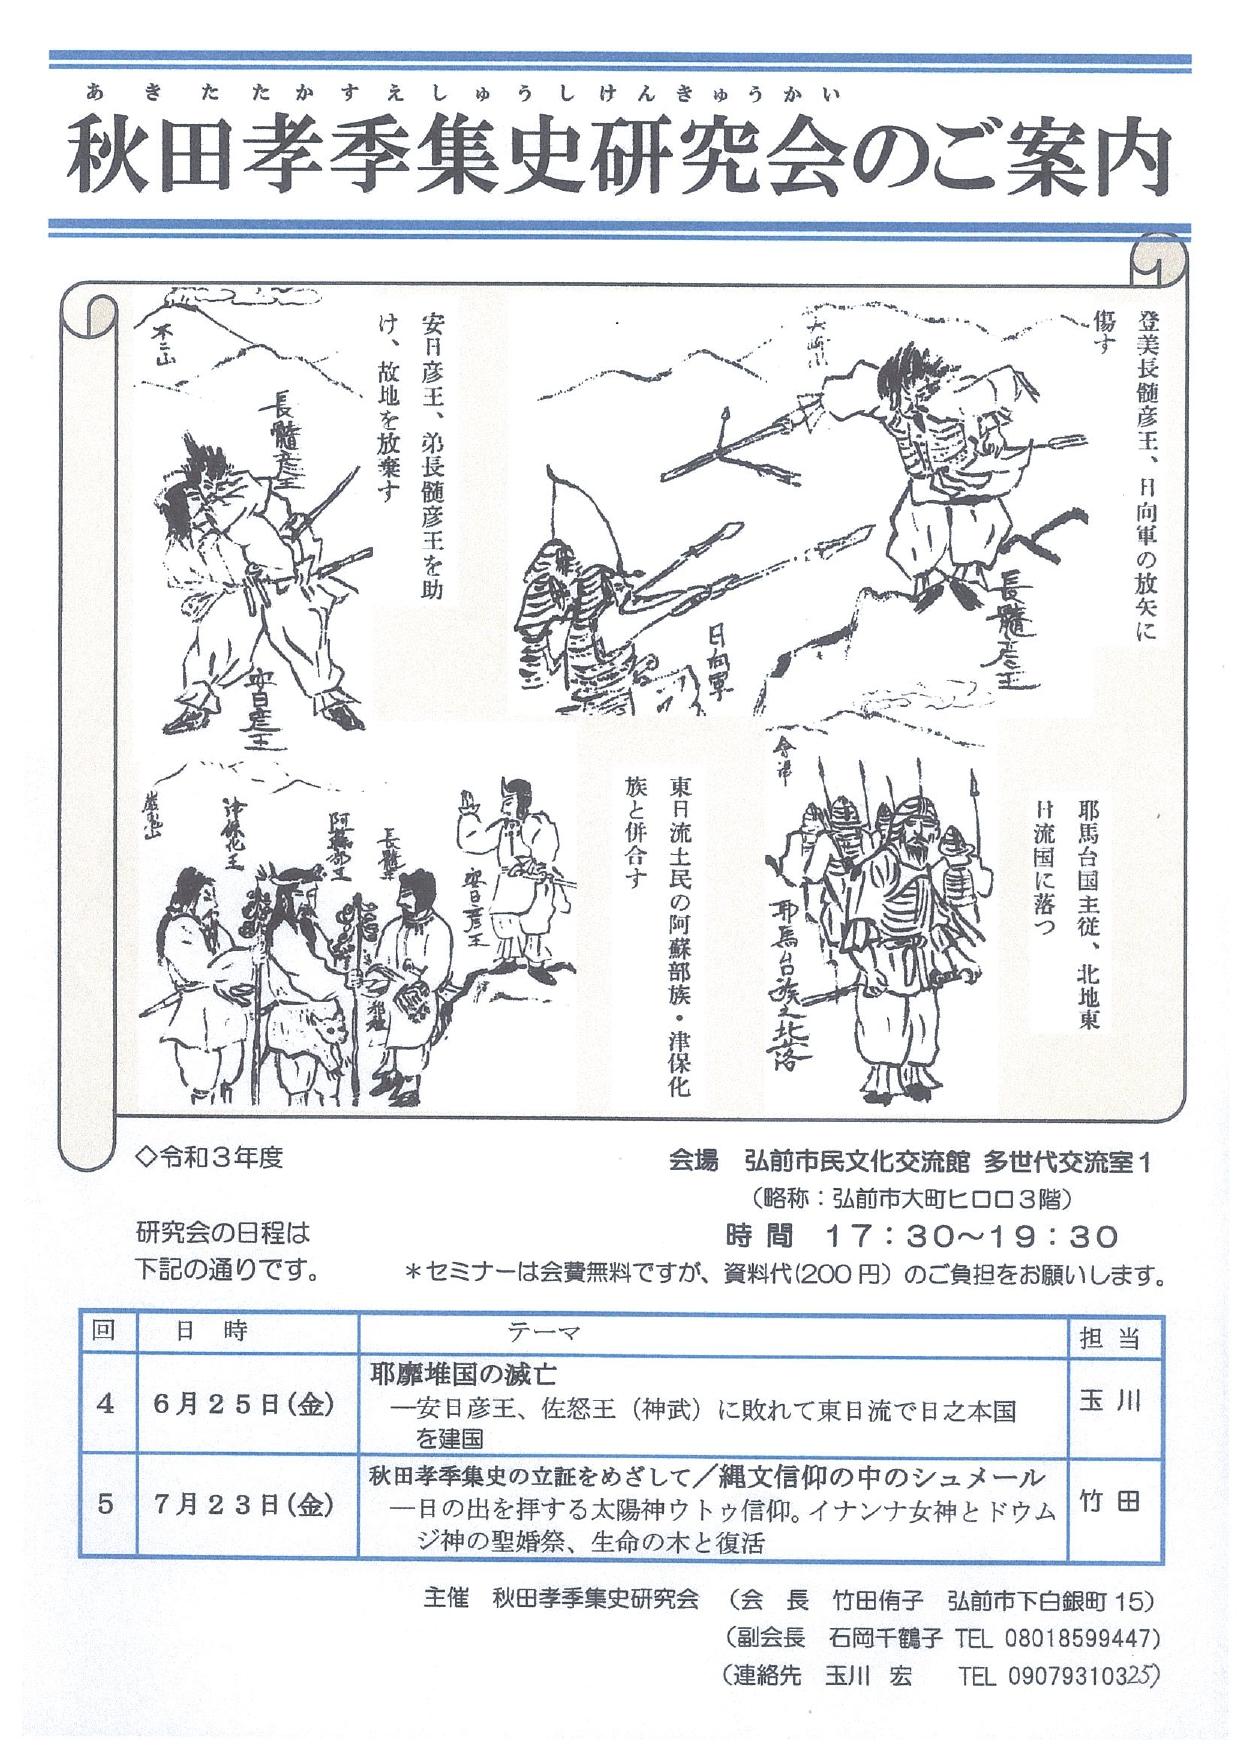 秋田孝季集史研究会 ご案内